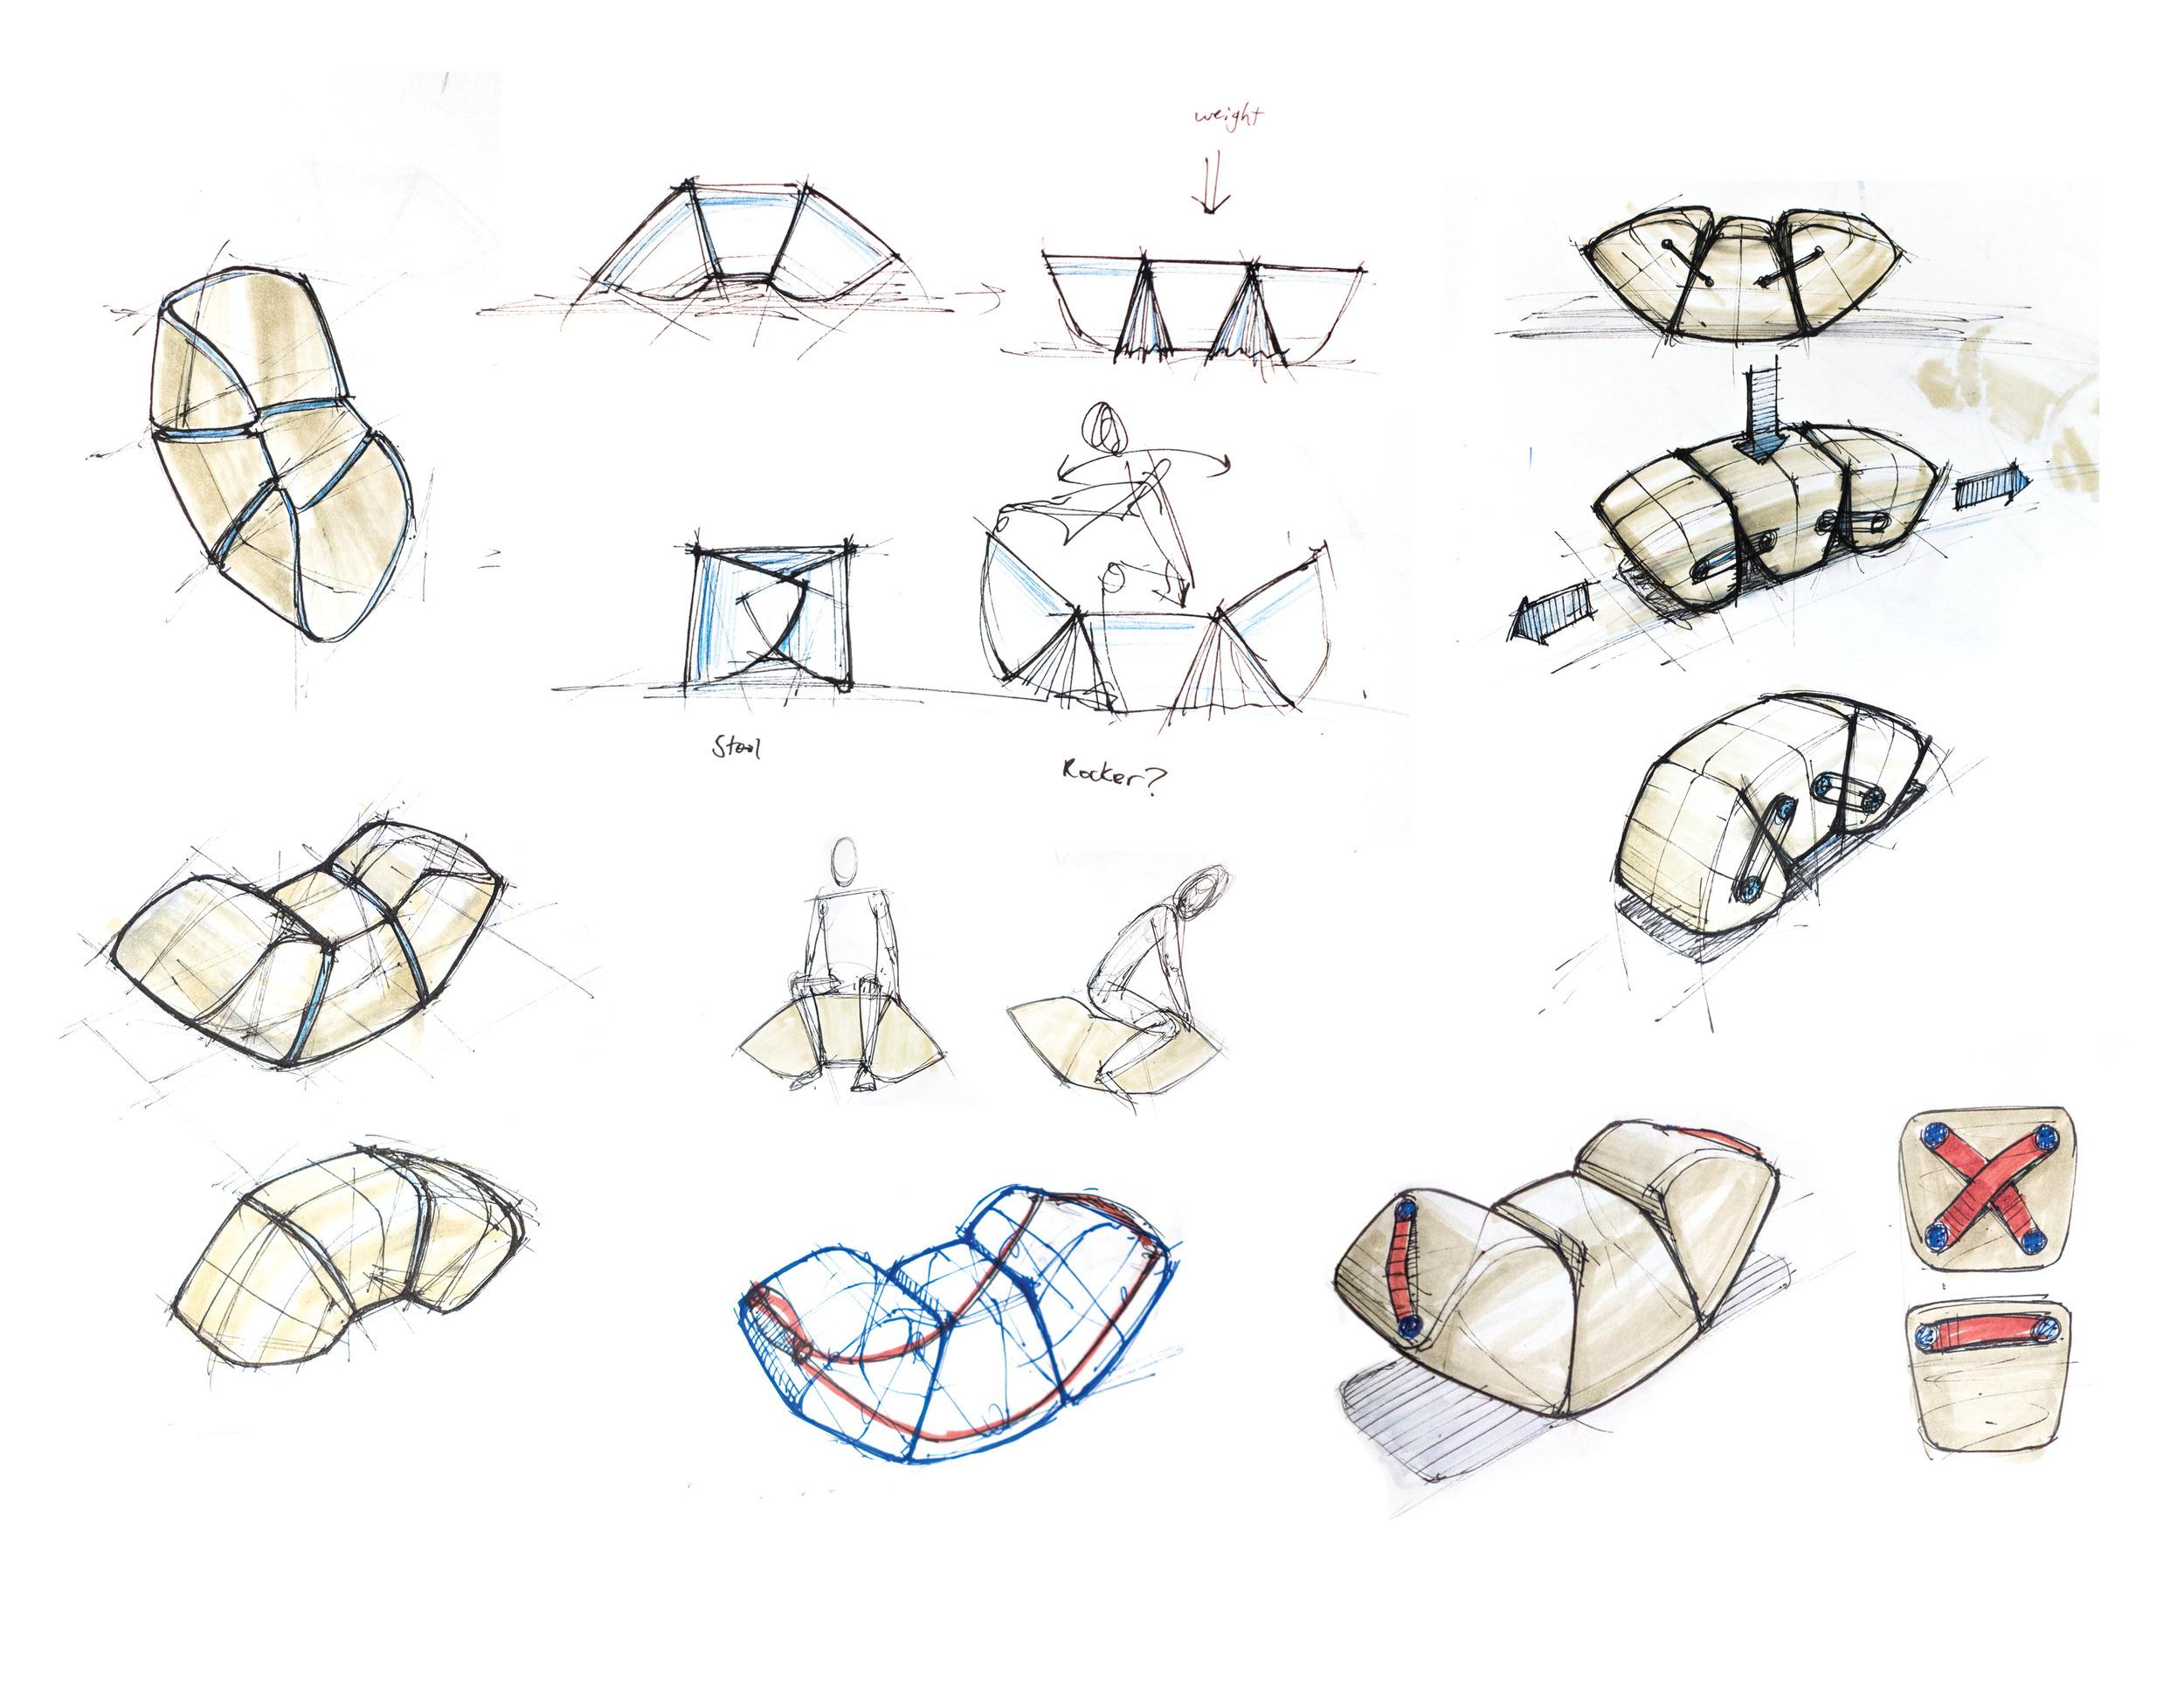 Sketch development